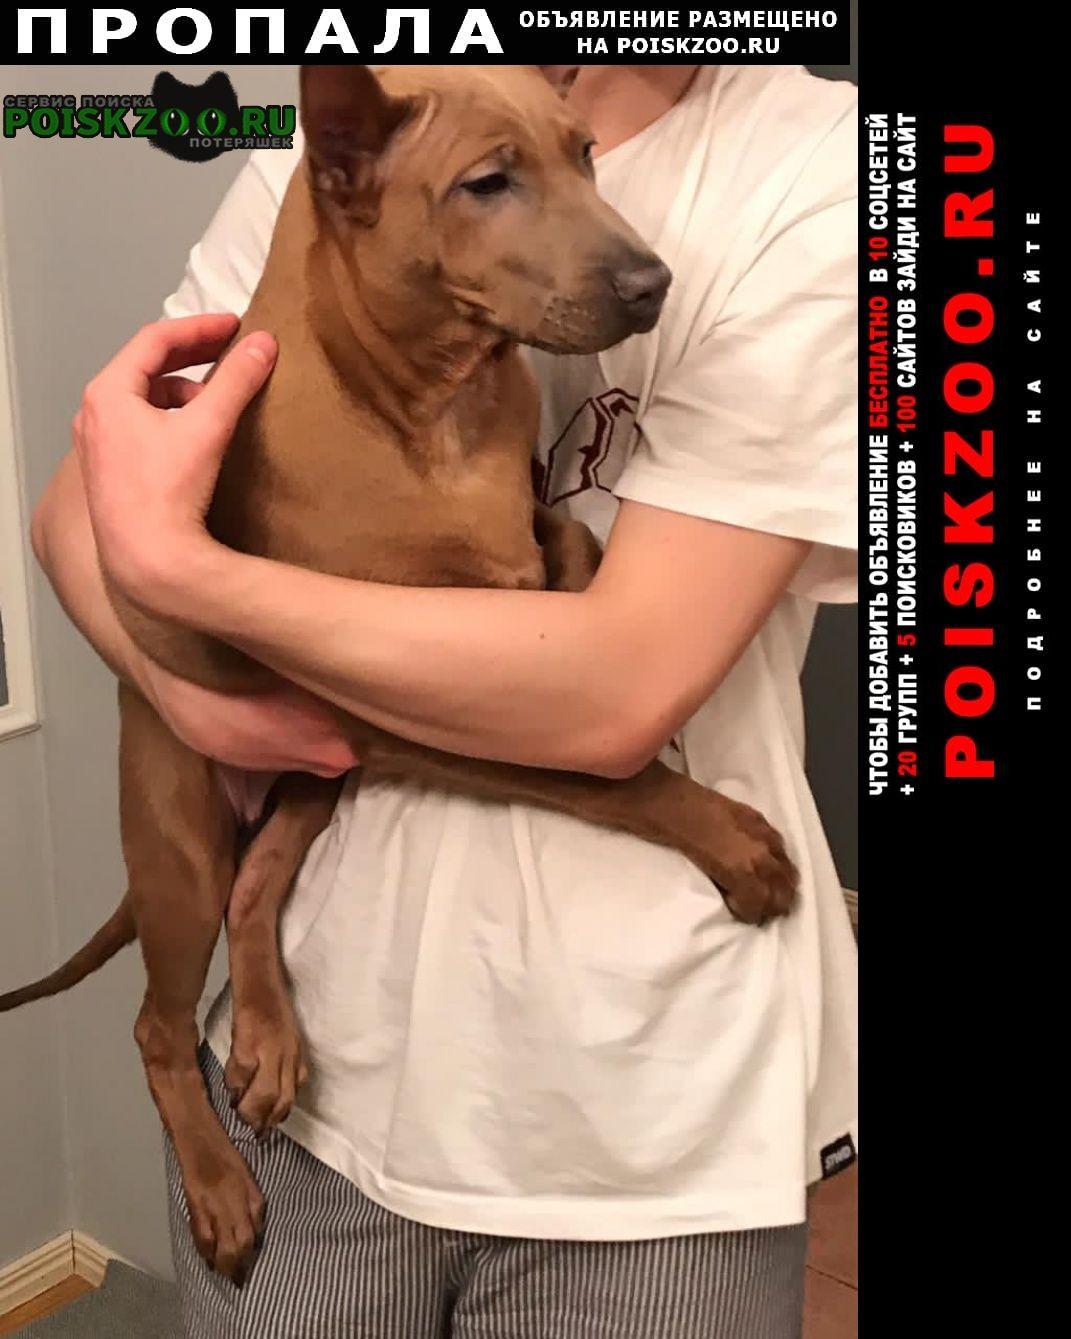 Пропала собака, р-н марфино, останкино Москва